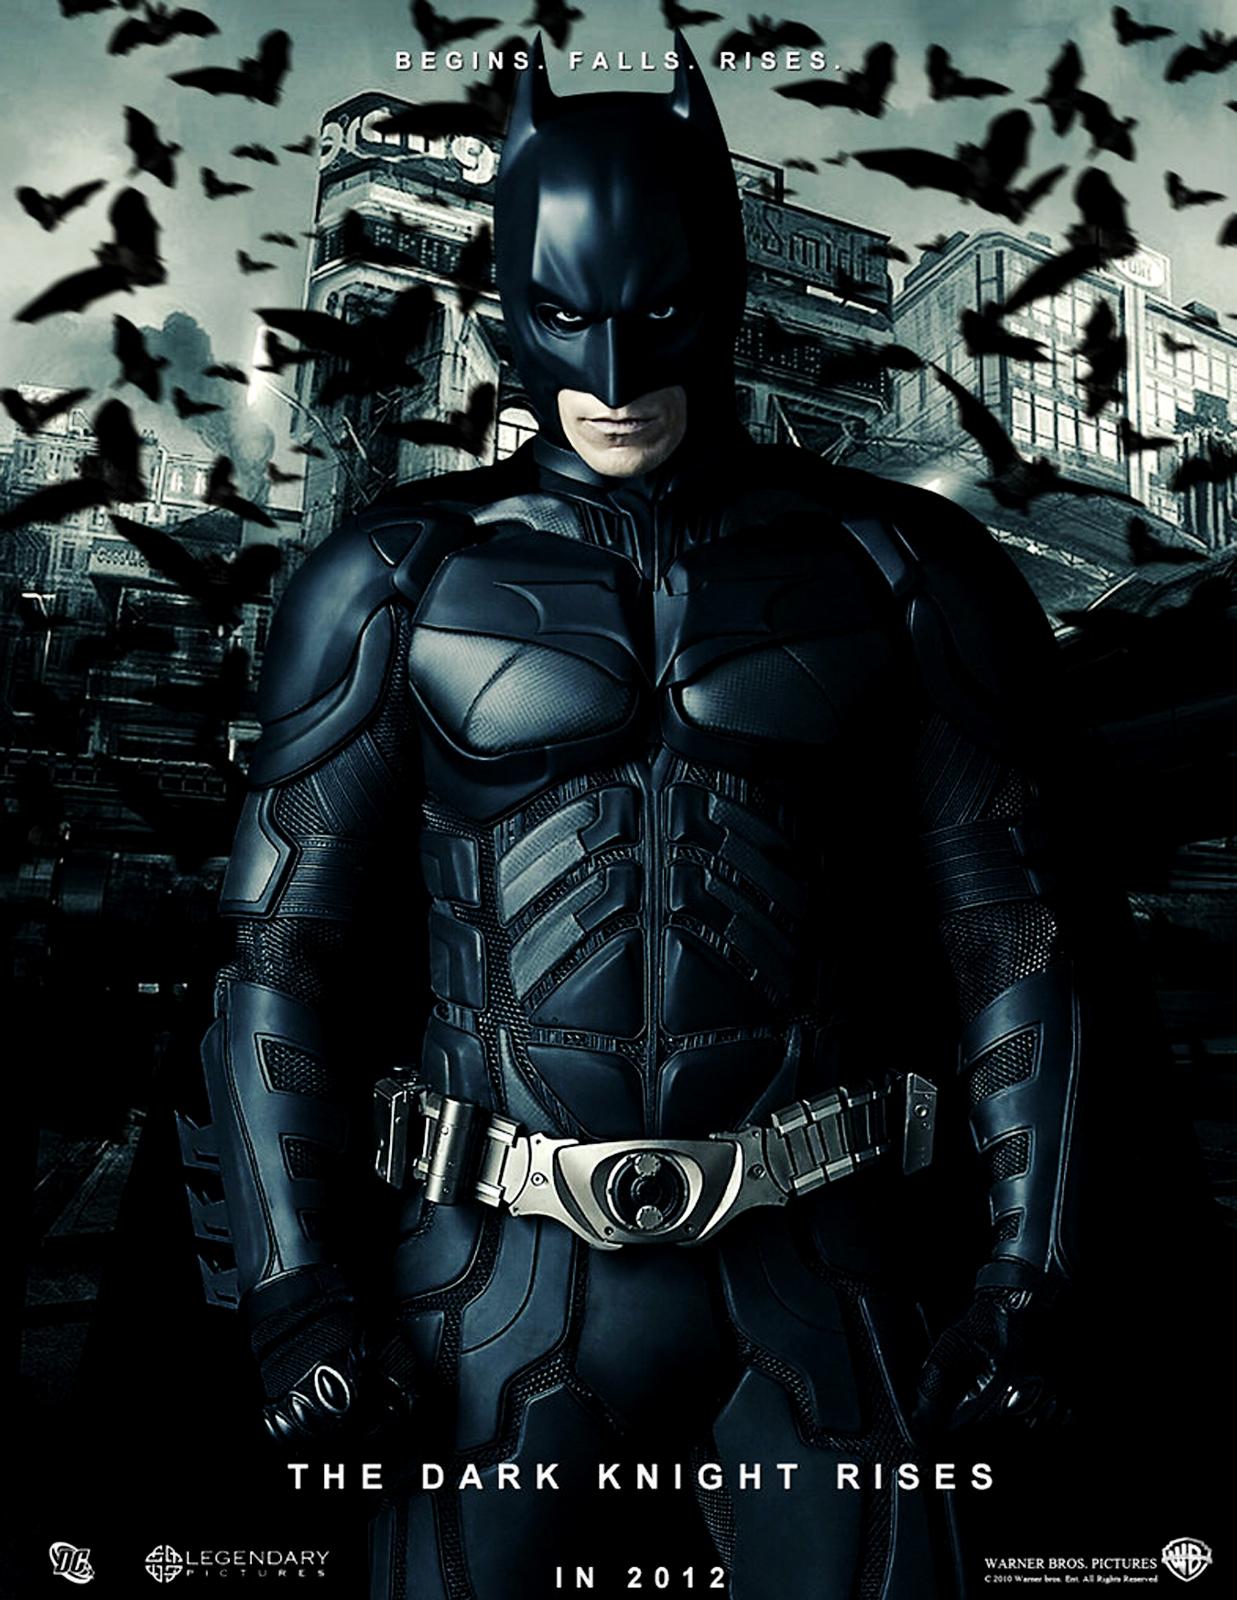 Wallpaper Batman The Dark Knight Rises 2012 HD Poster Wallpapers 1237x1600